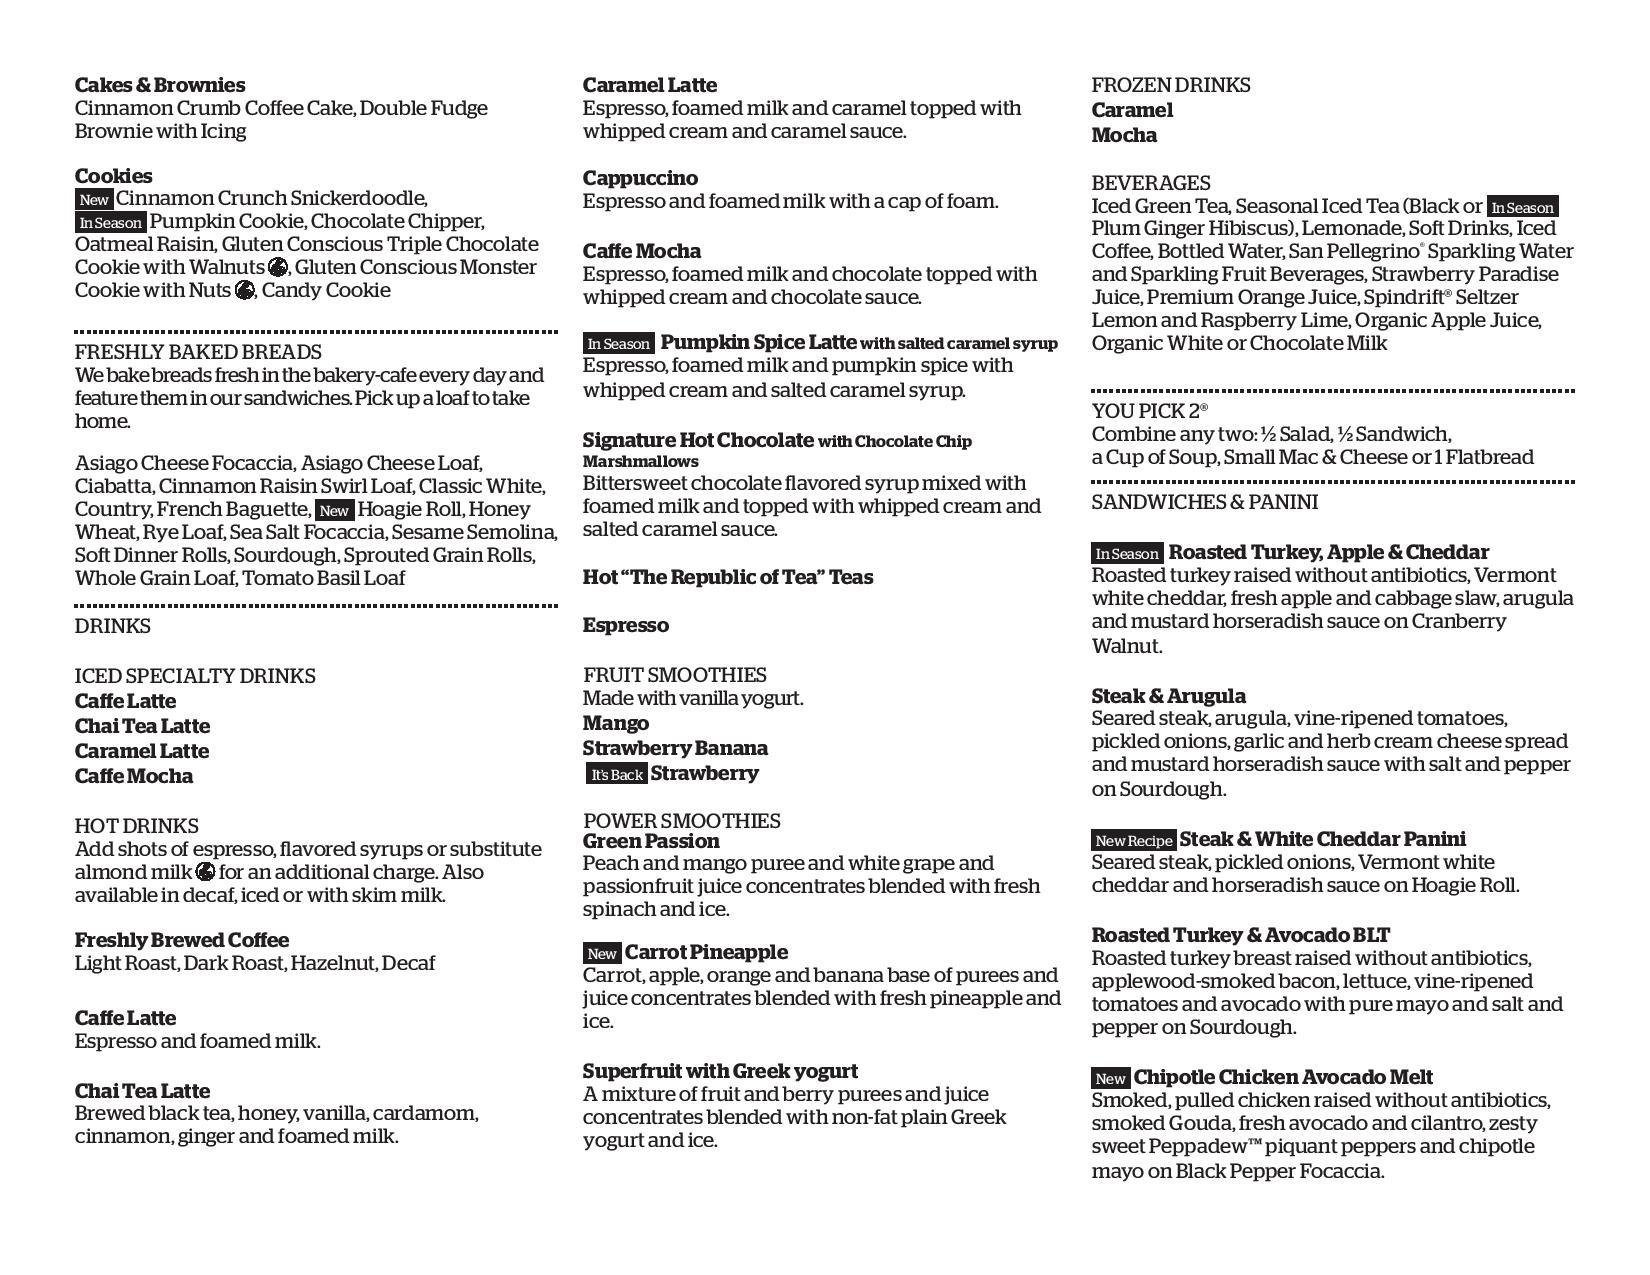 menu-retail-1-page-002